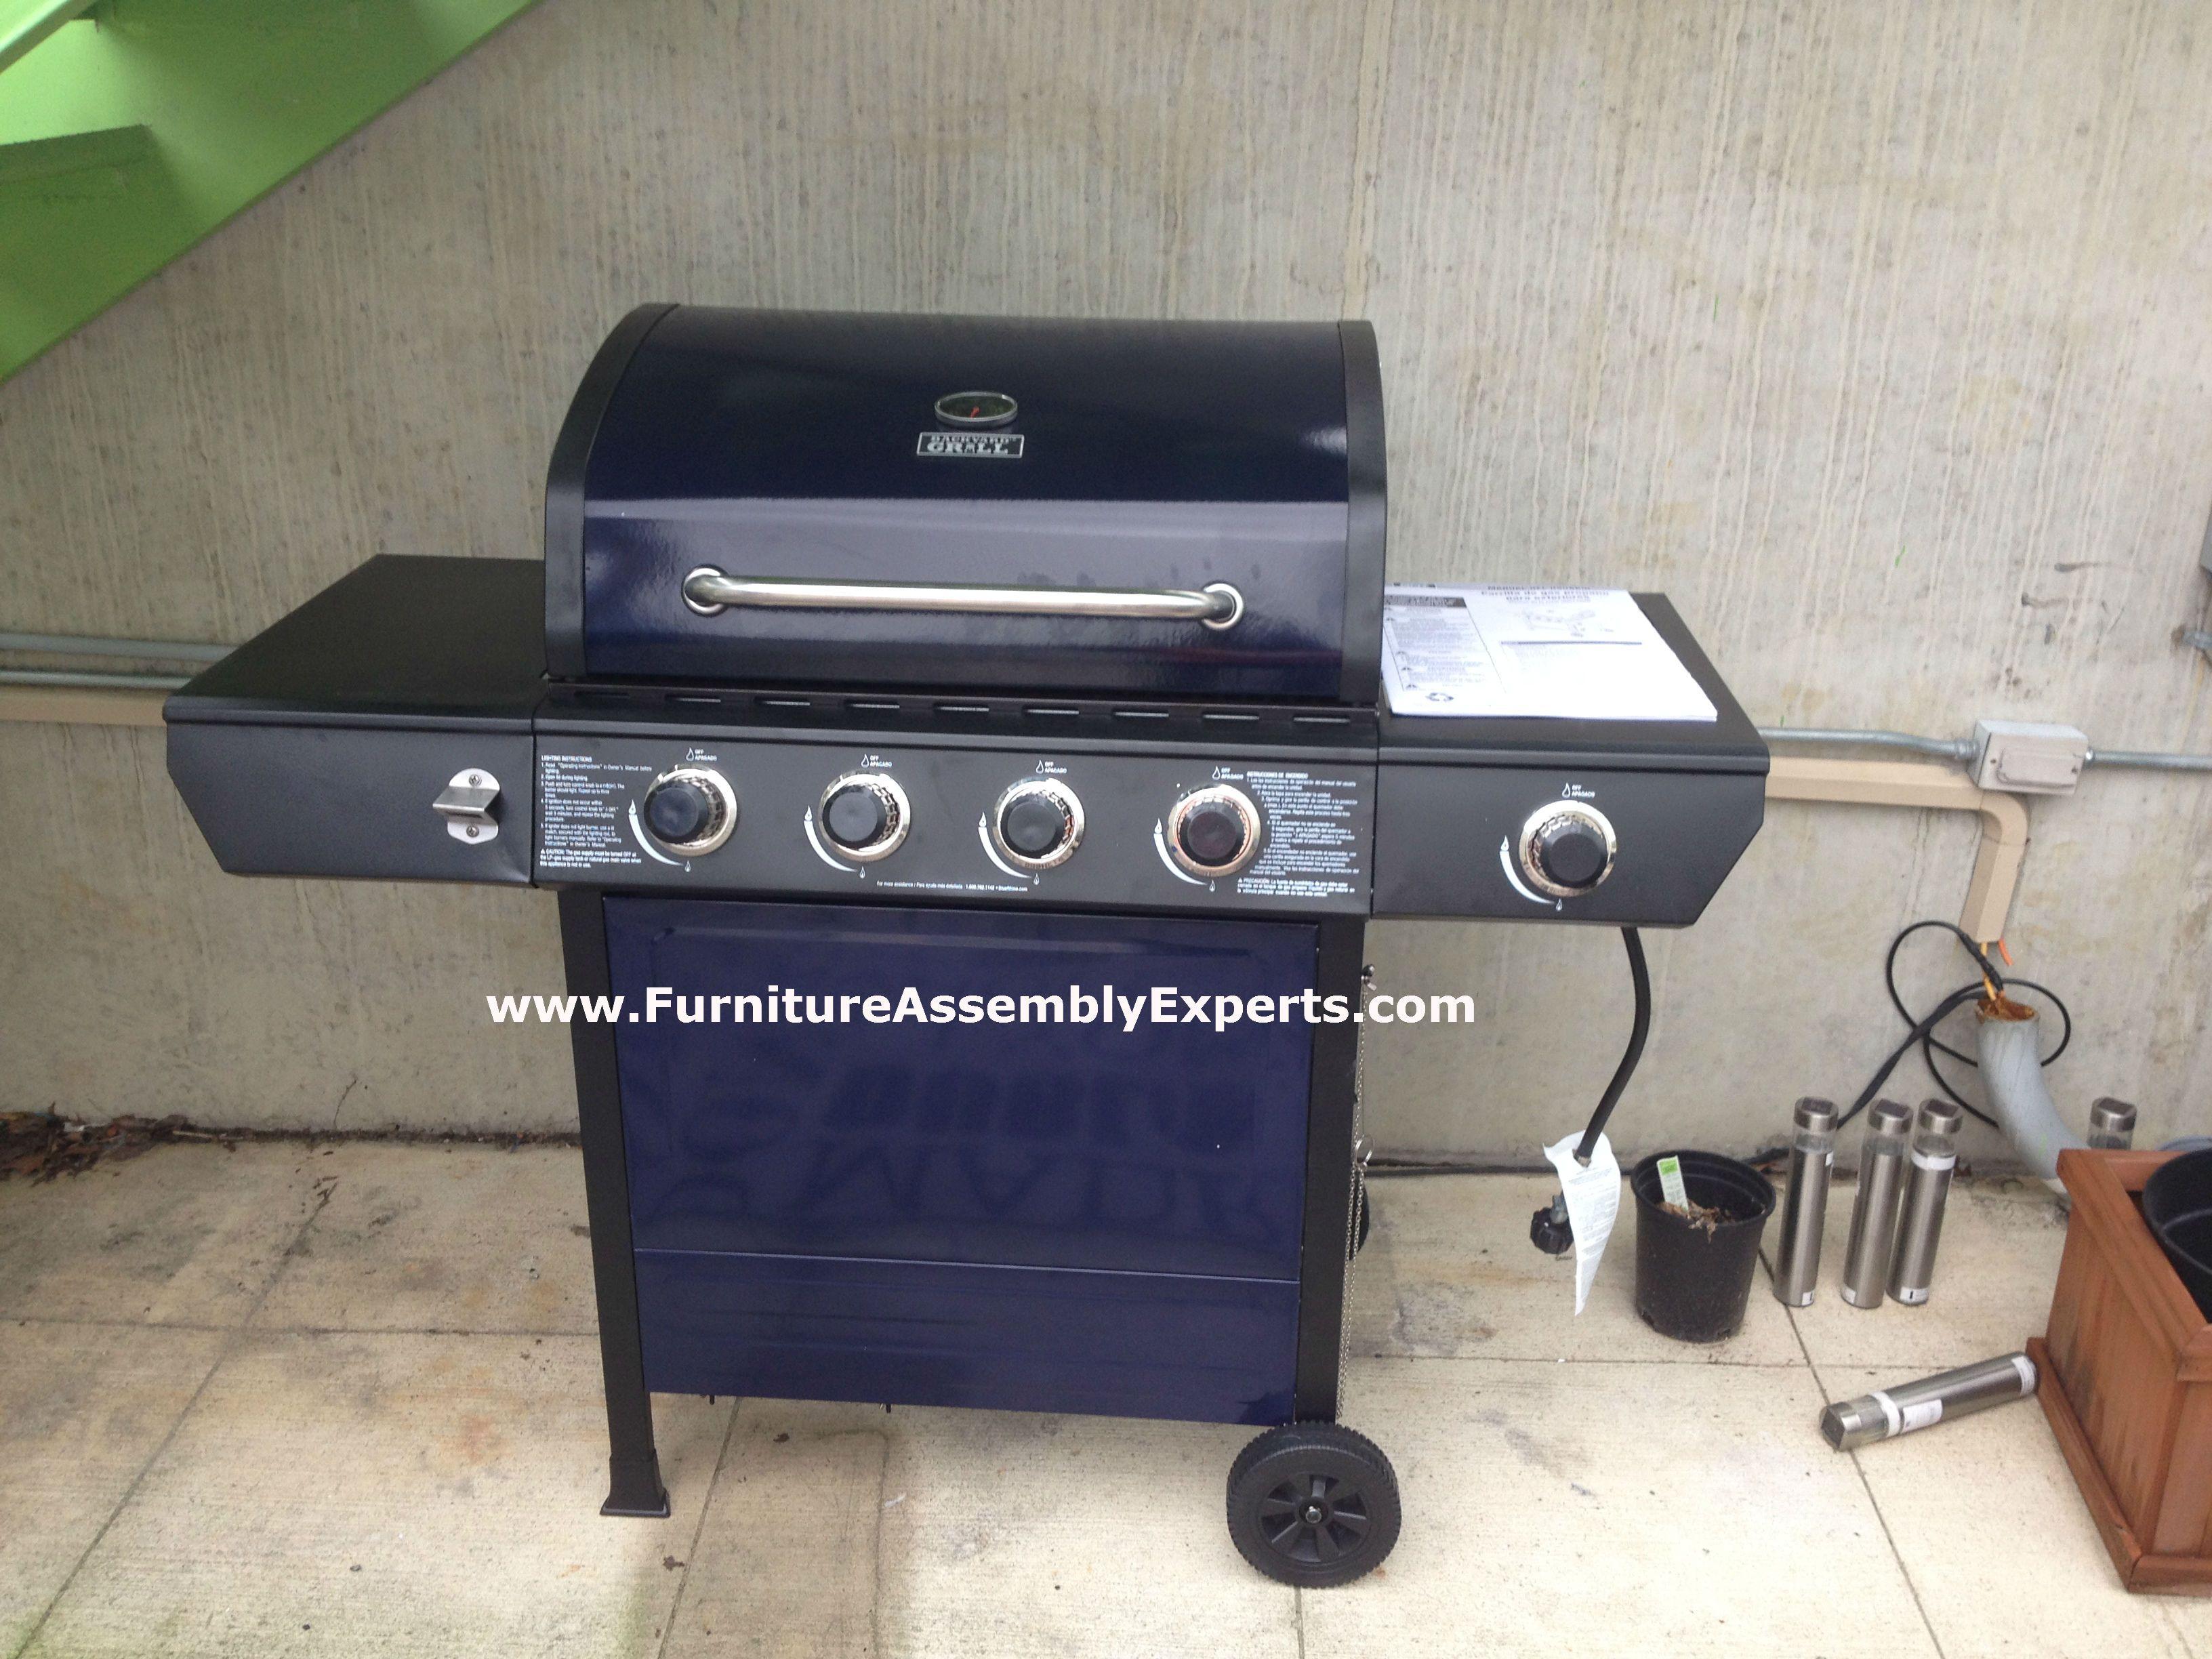 Walmart Backyard Grill 4 Burner Propane Gas Grill Assembled In Washington  DC For A Personal